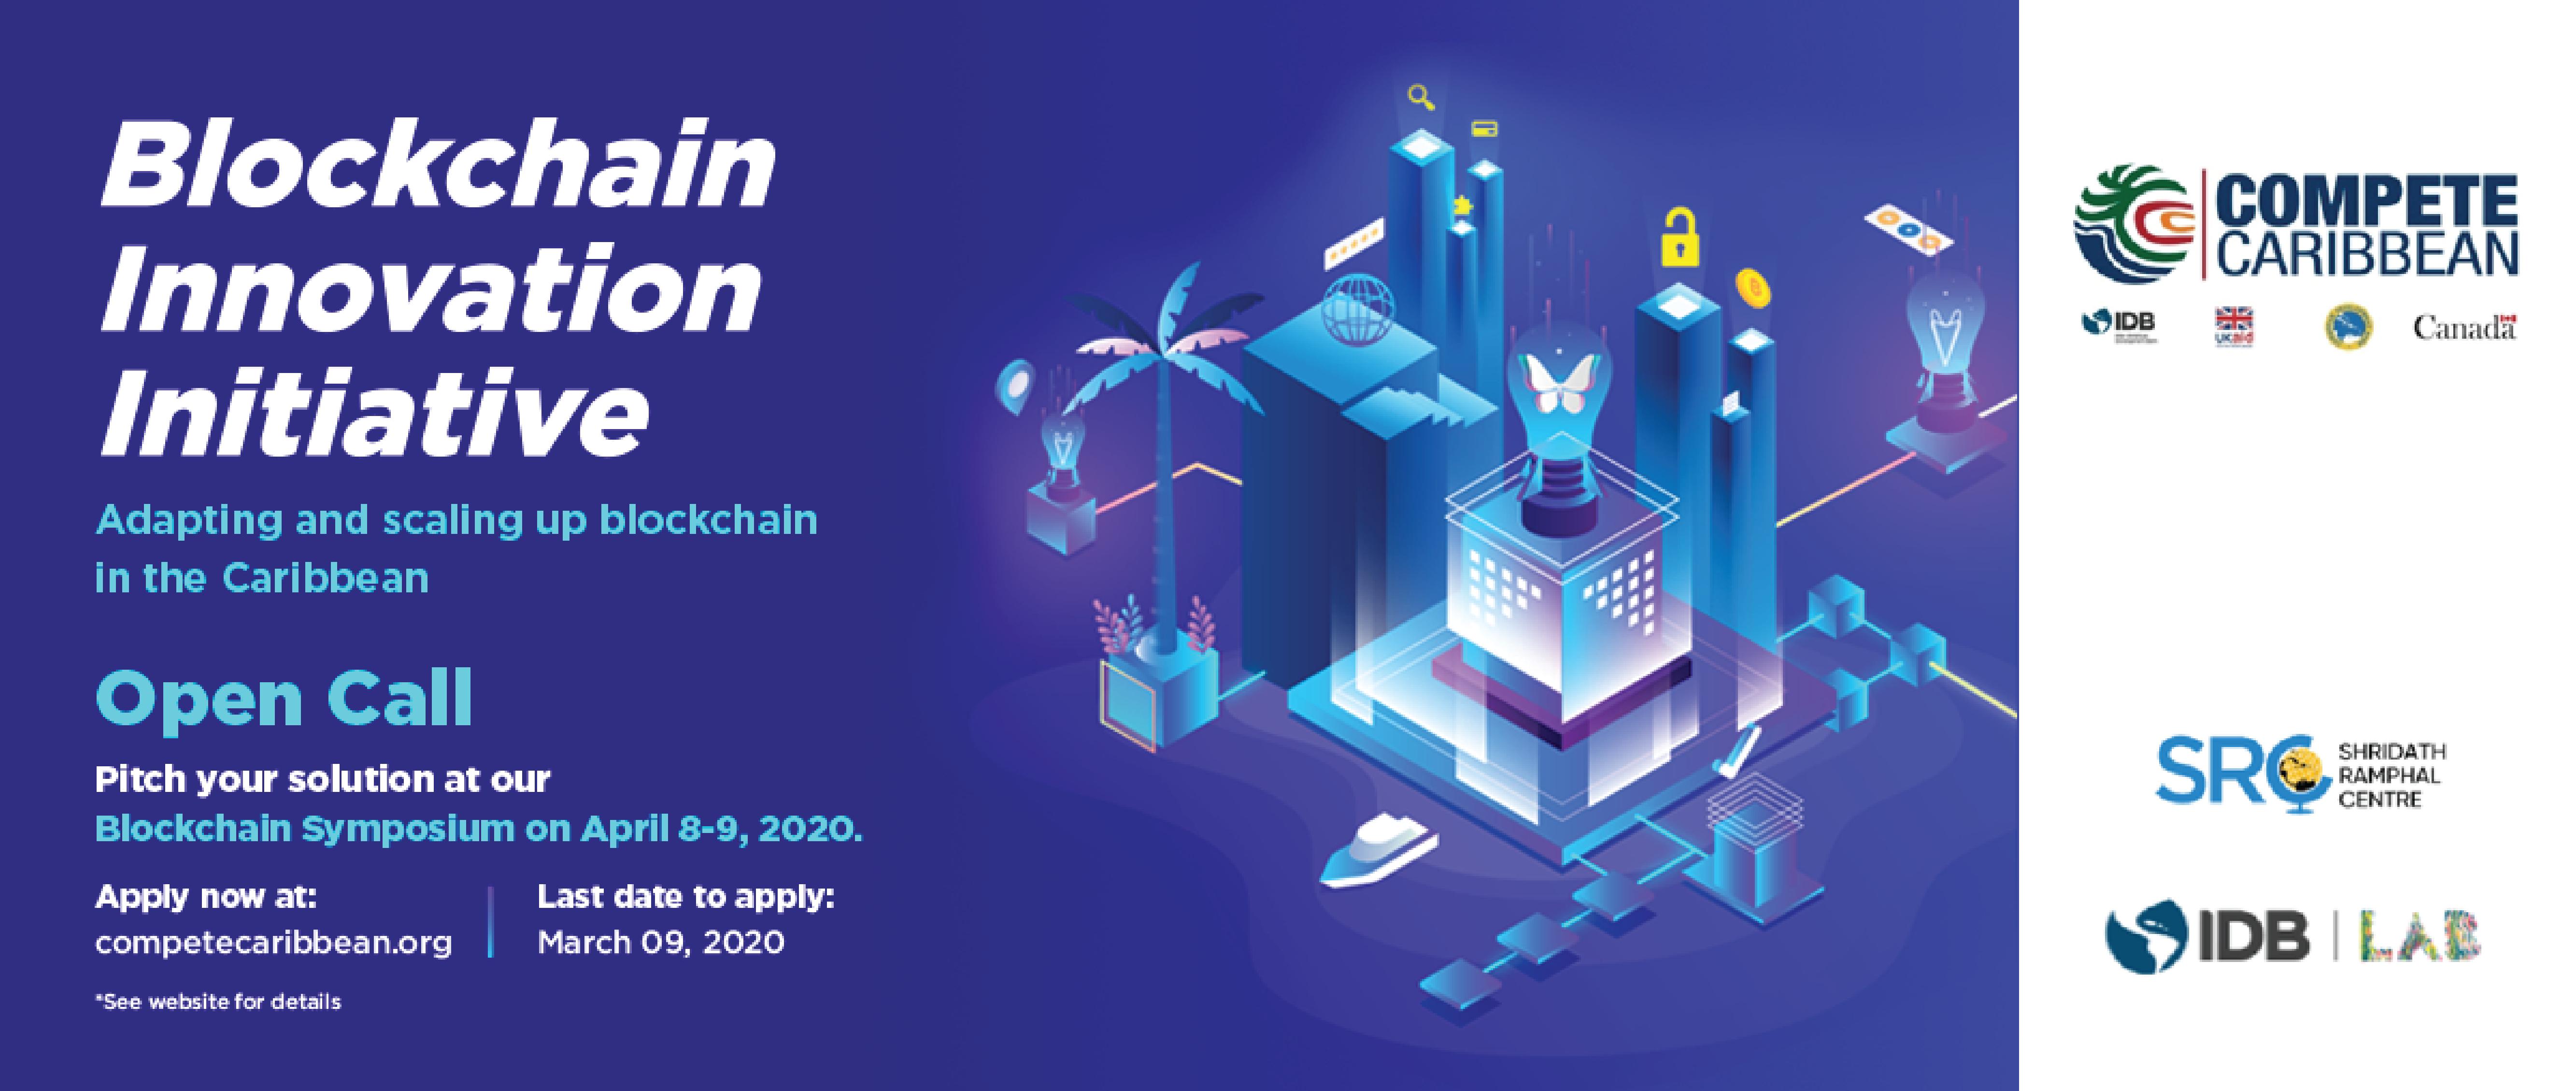 Caribbean Blockchain Innovation Initiative